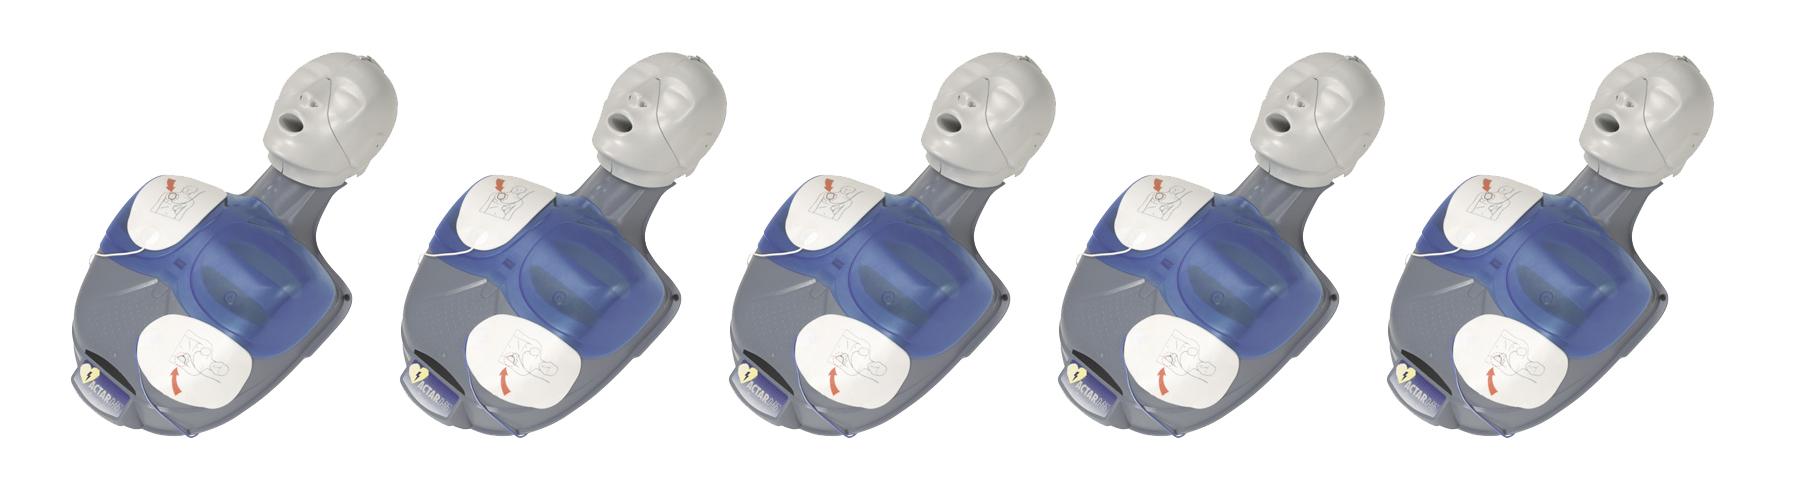 ACTAR D-FIB reanimatiepoppen (5 stuks)